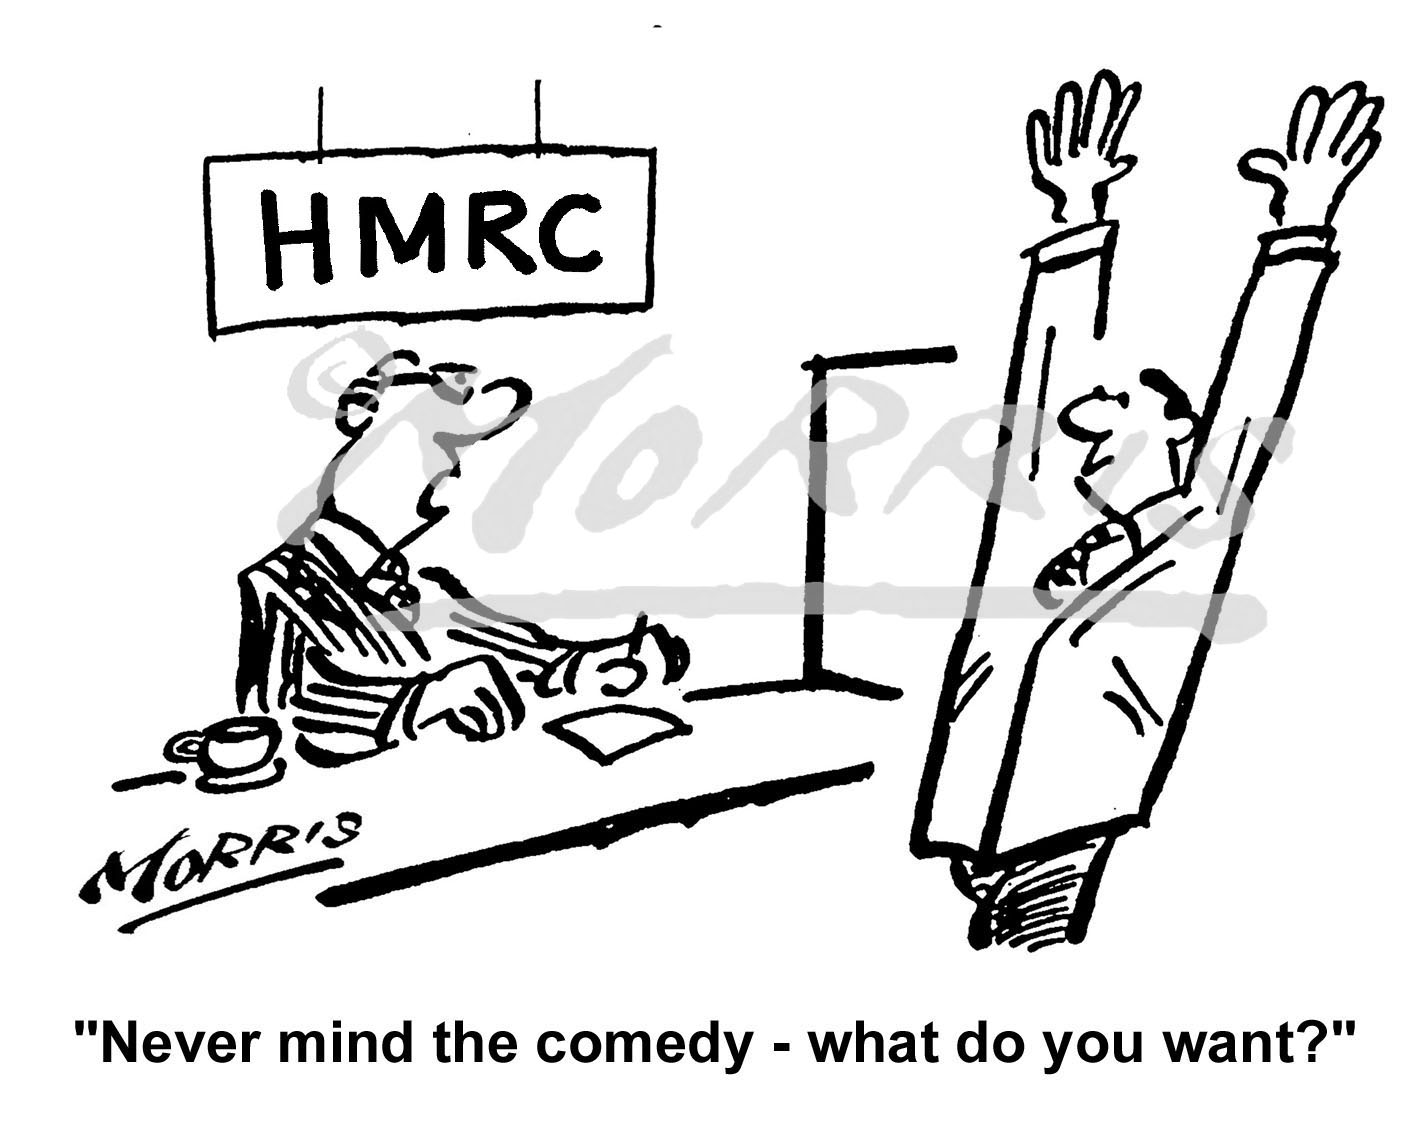 hmrc cartoon tax cartoon taxation cartoon ref 0484bw business